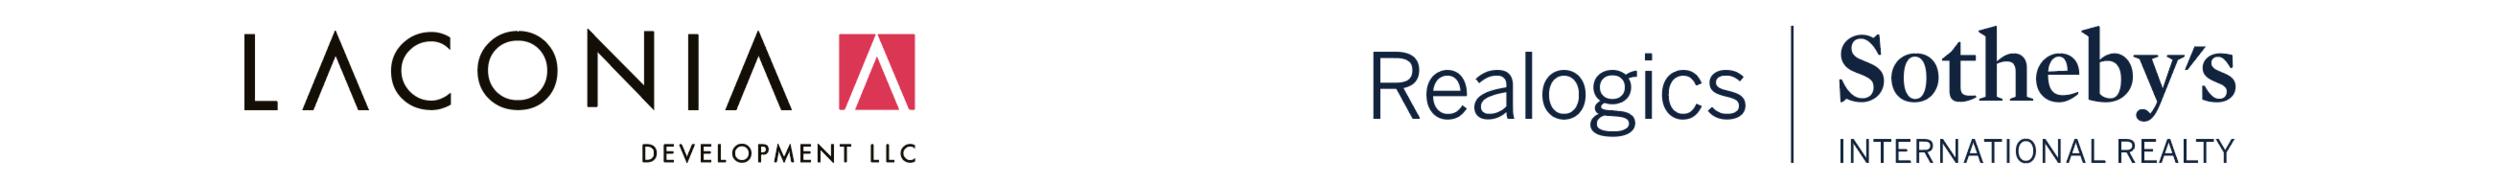 Laconia-Realogics Logo.png